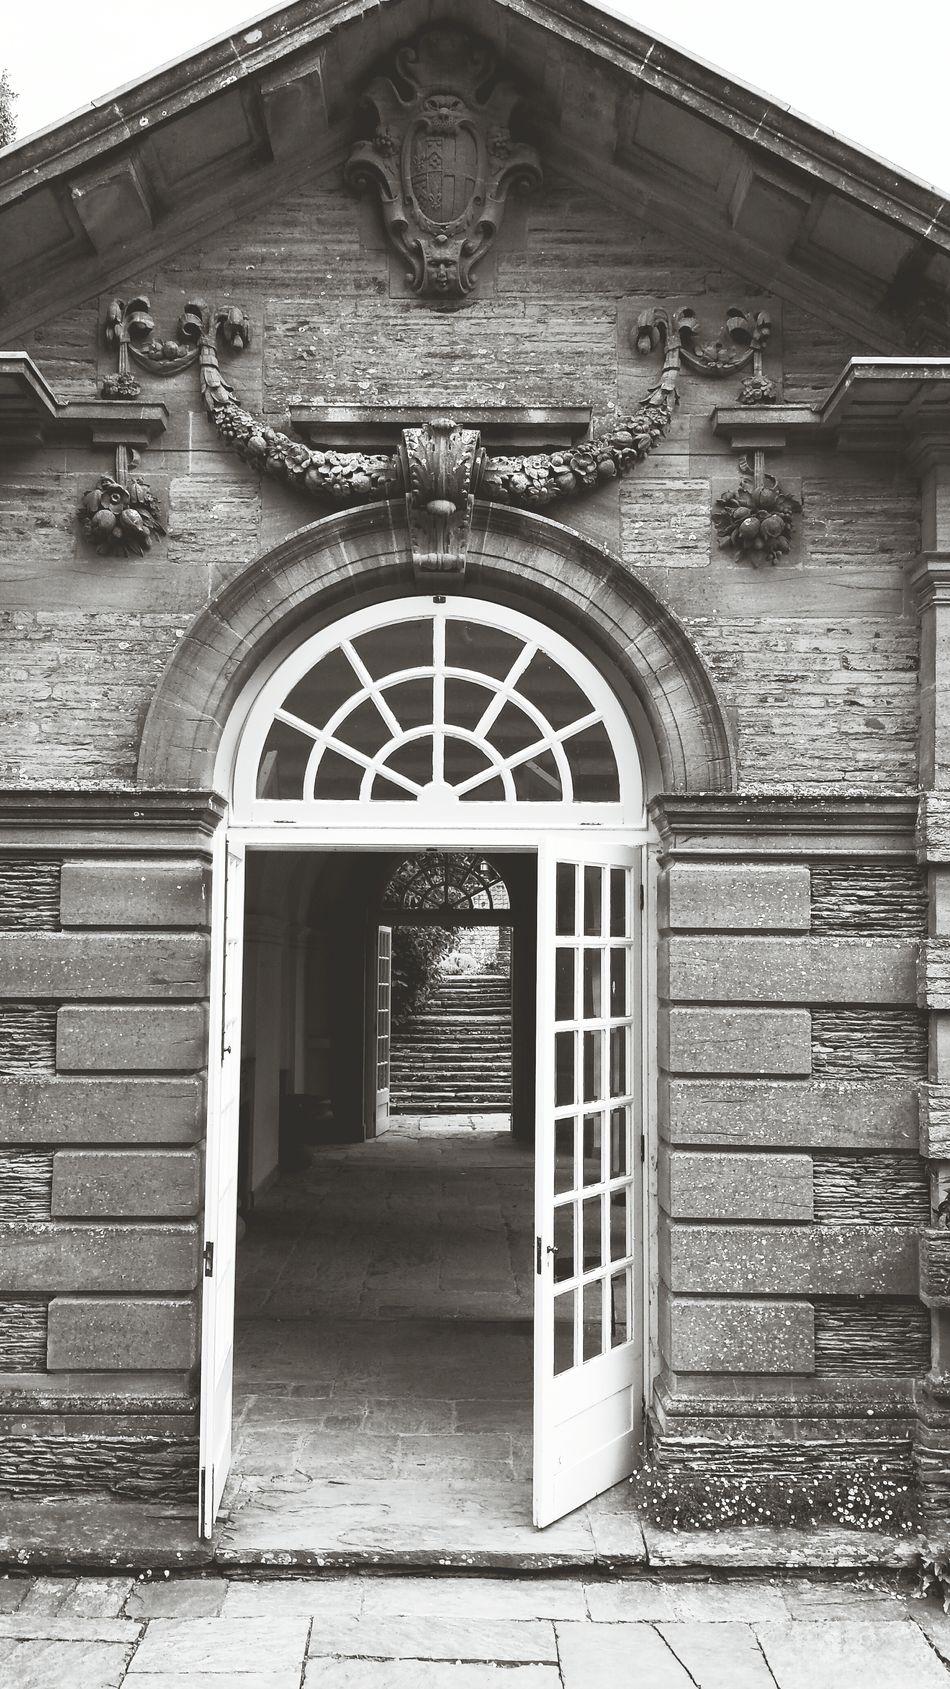 Stone Buildings Outdoors Hestercombe House Somerset England Blackandwhite Historical